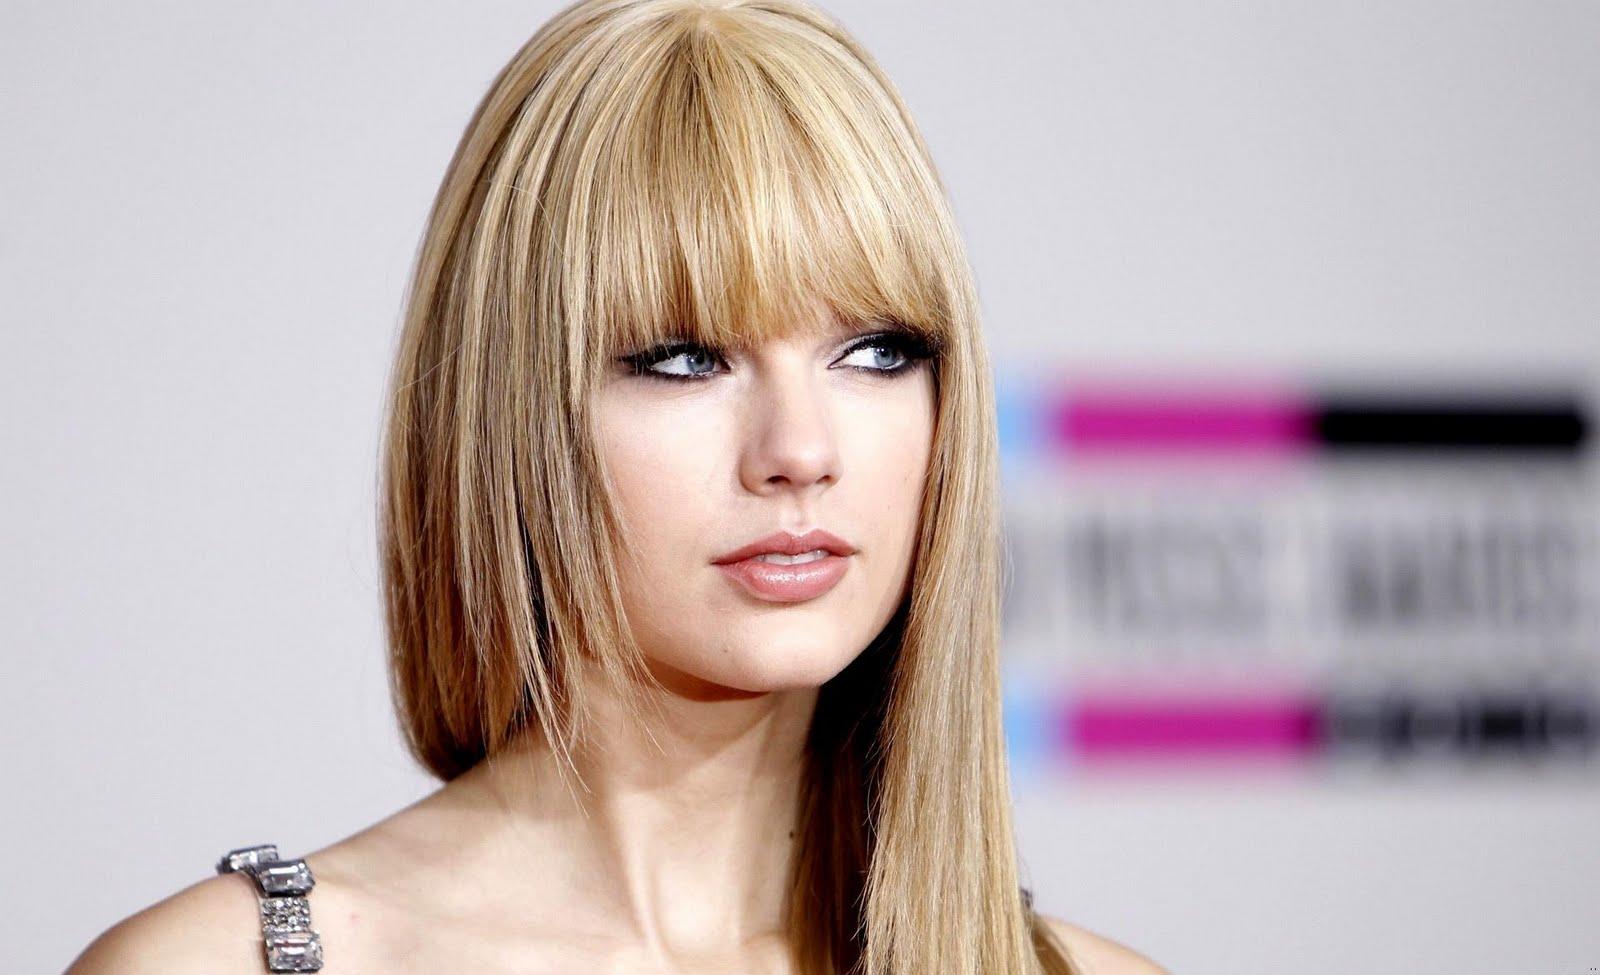 http://2.bp.blogspot.com/-GxtxR0Kh1OQ/TwmmRQV5bTI/AAAAAAAANDk/i4AZLsvxIk0/s1600/Taylor_Swift_american_idol_singer_wallpapers_lips.jpg